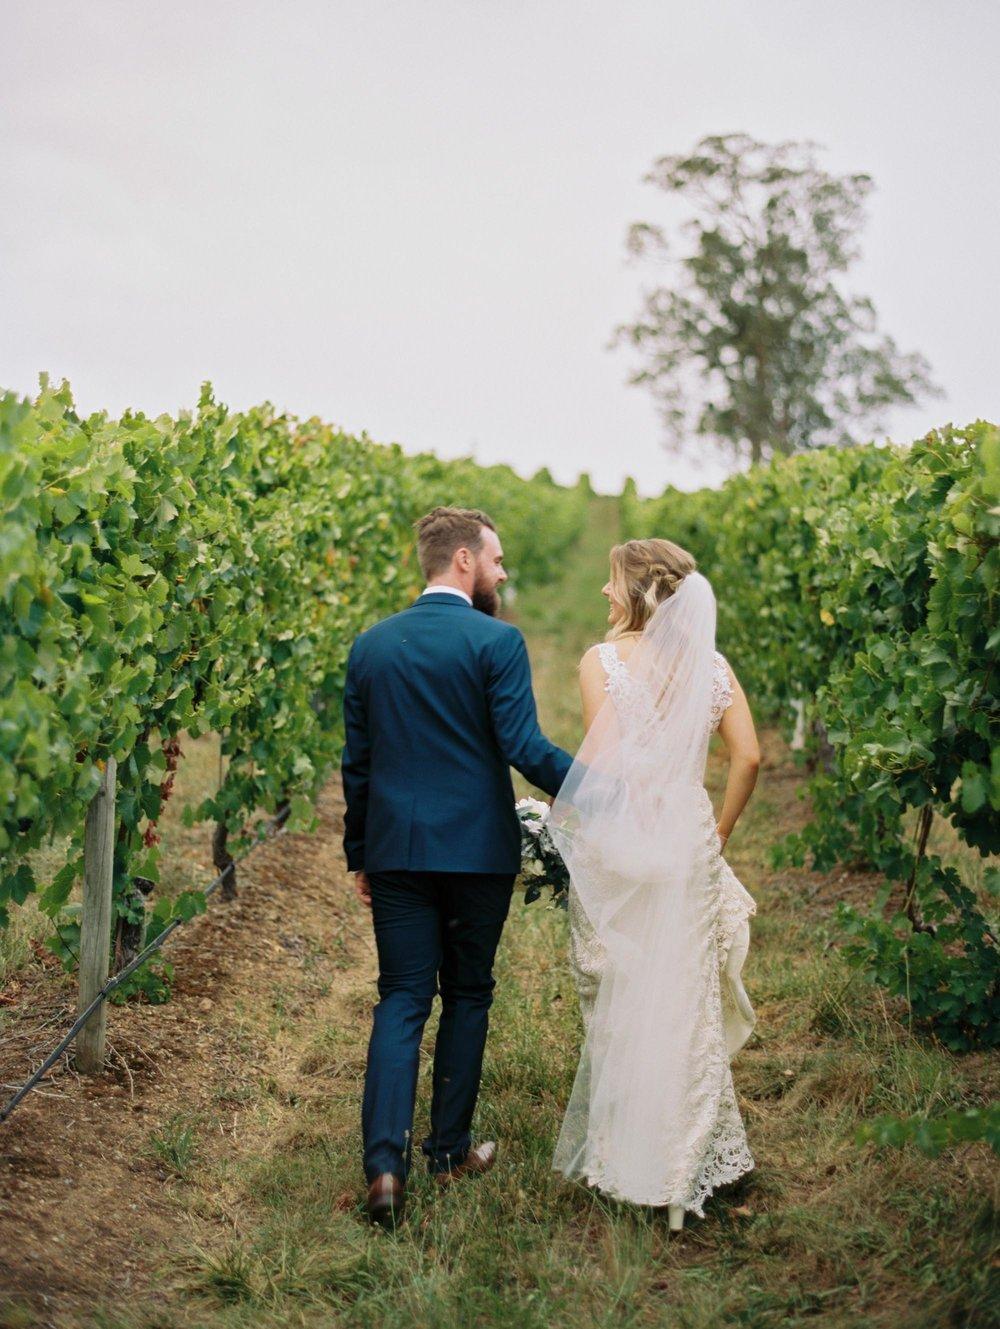 Golding-Wines-wedding-photography-084.jpg